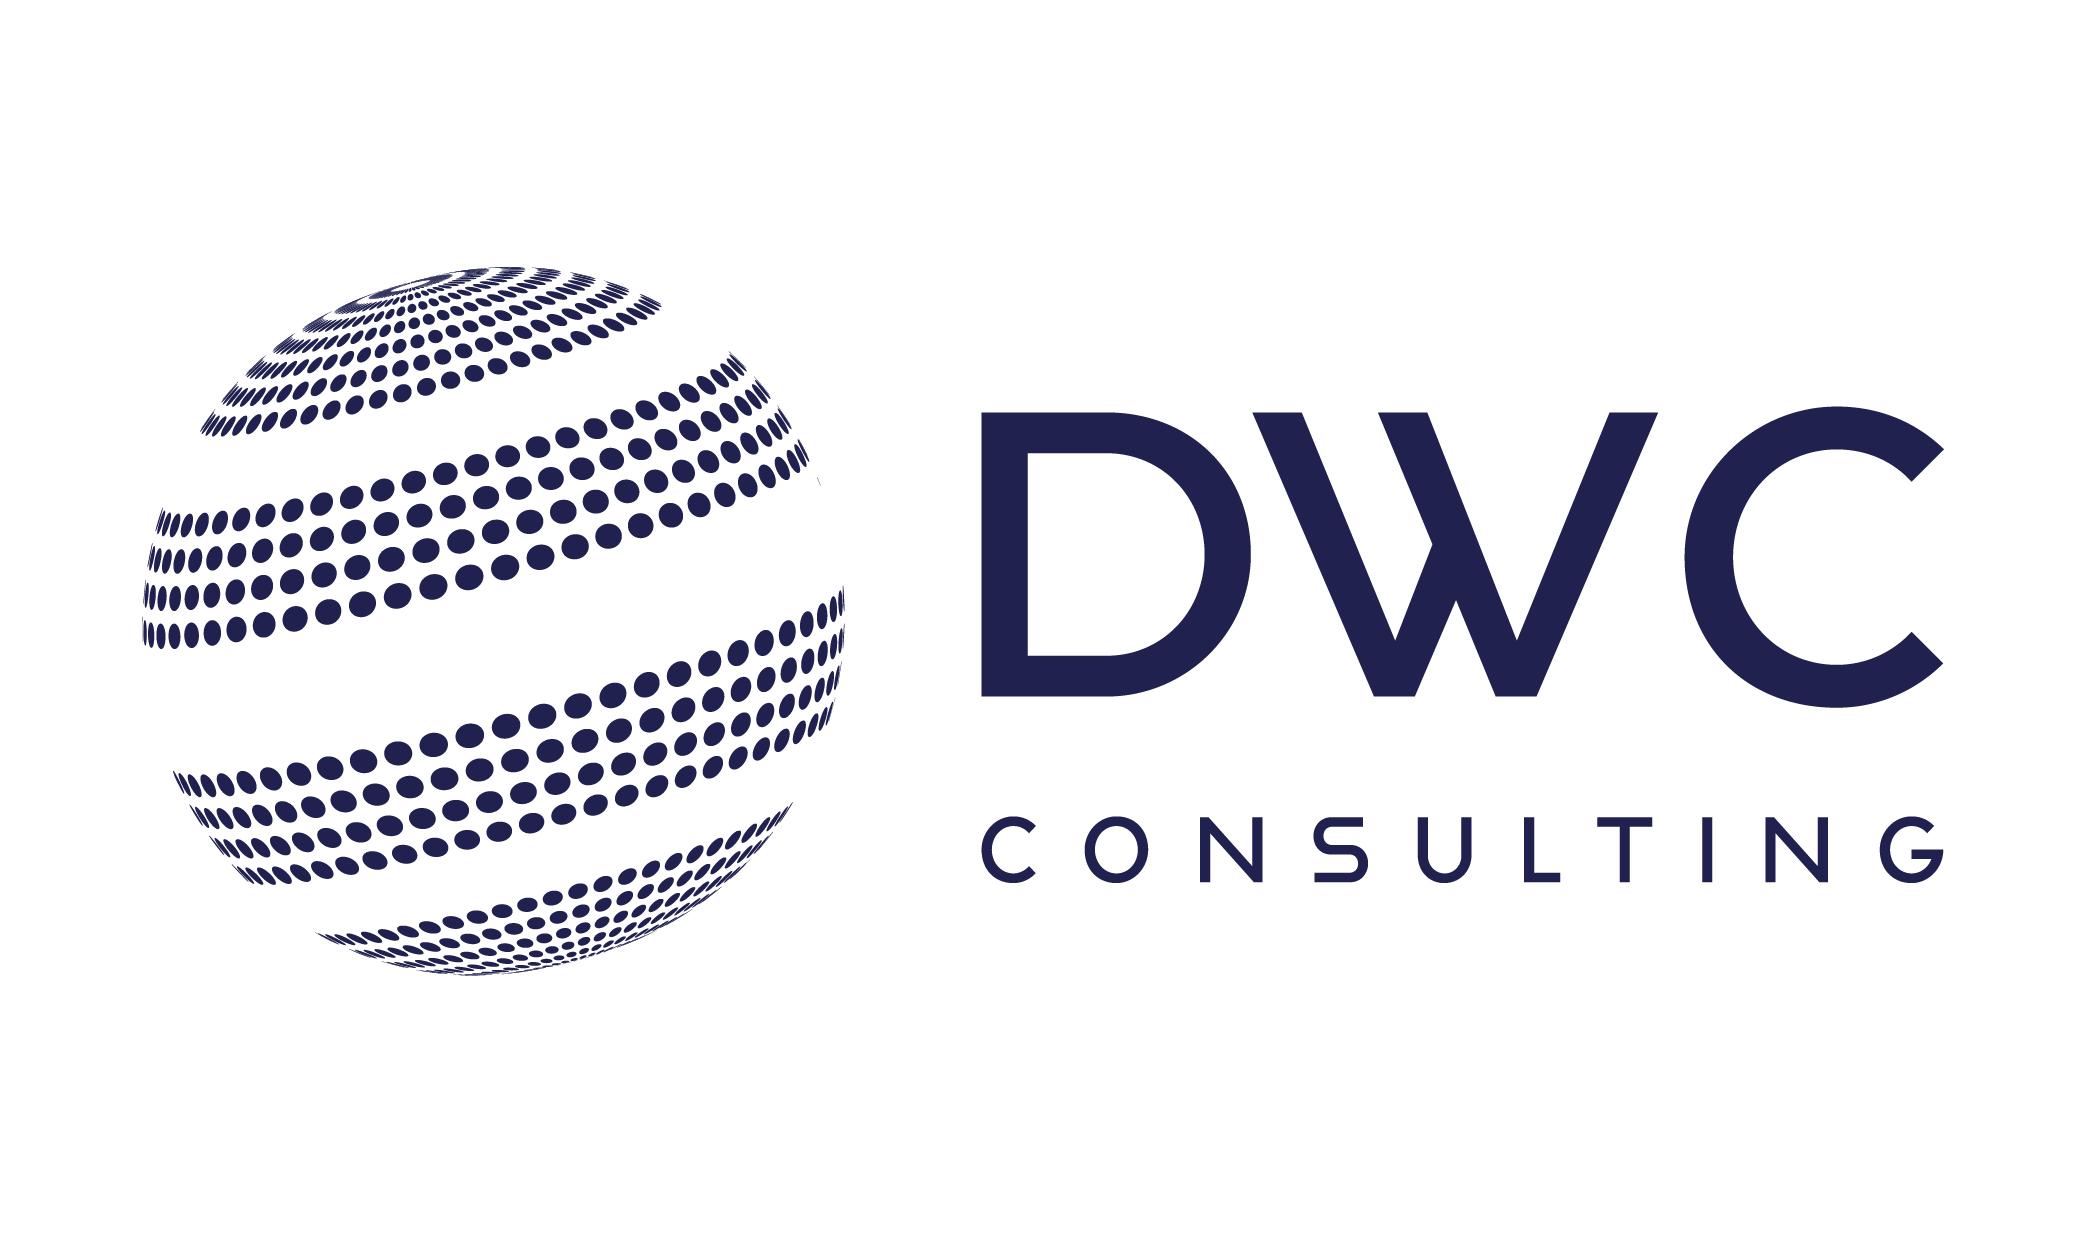 DWC Consulting logo